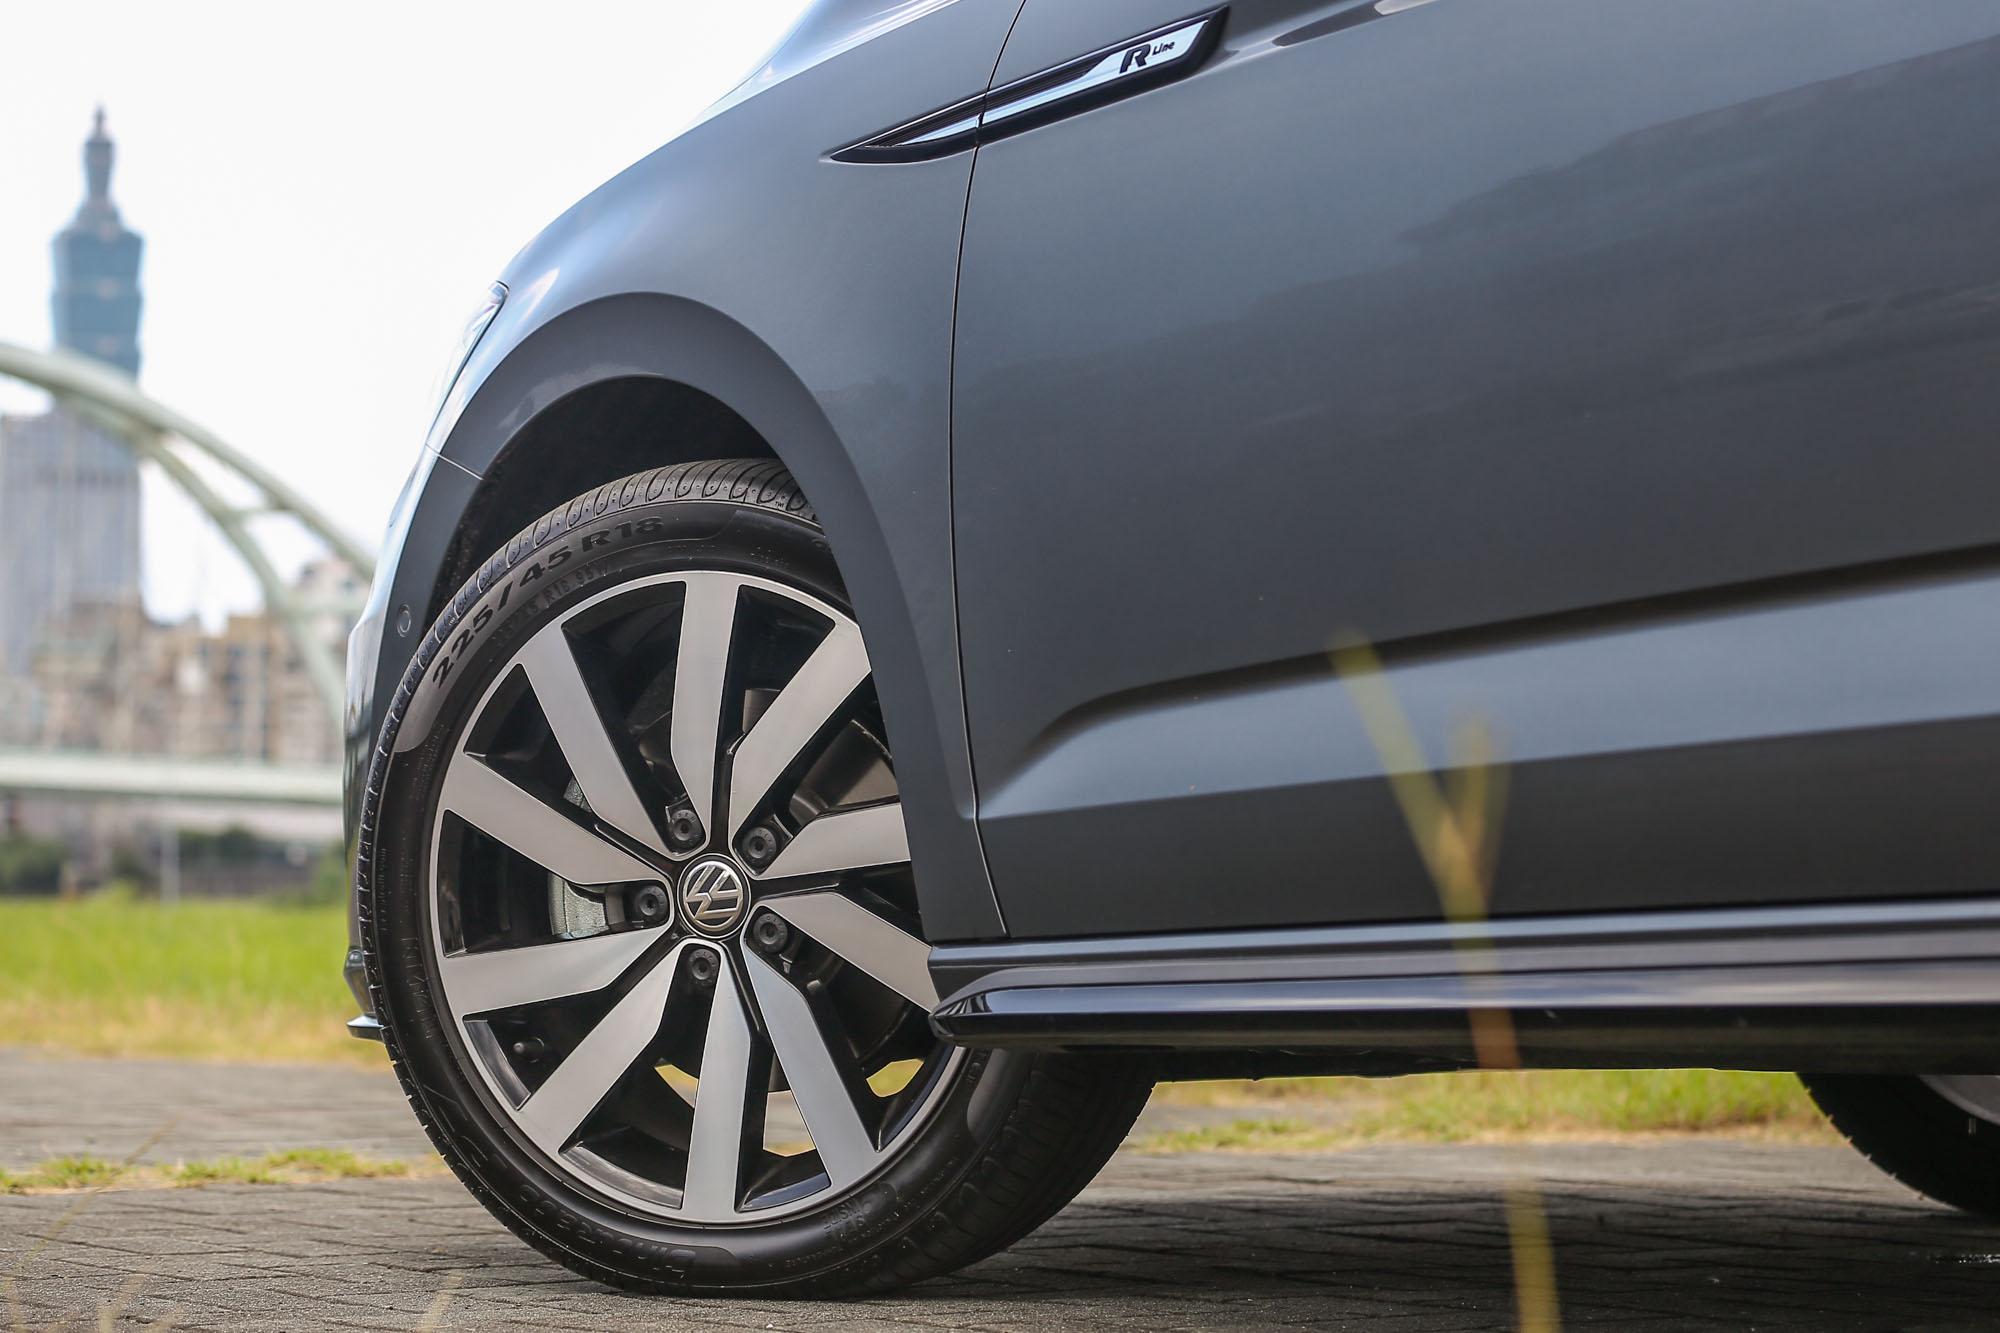 18 吋輪圈為 R-Line 車型專屬。